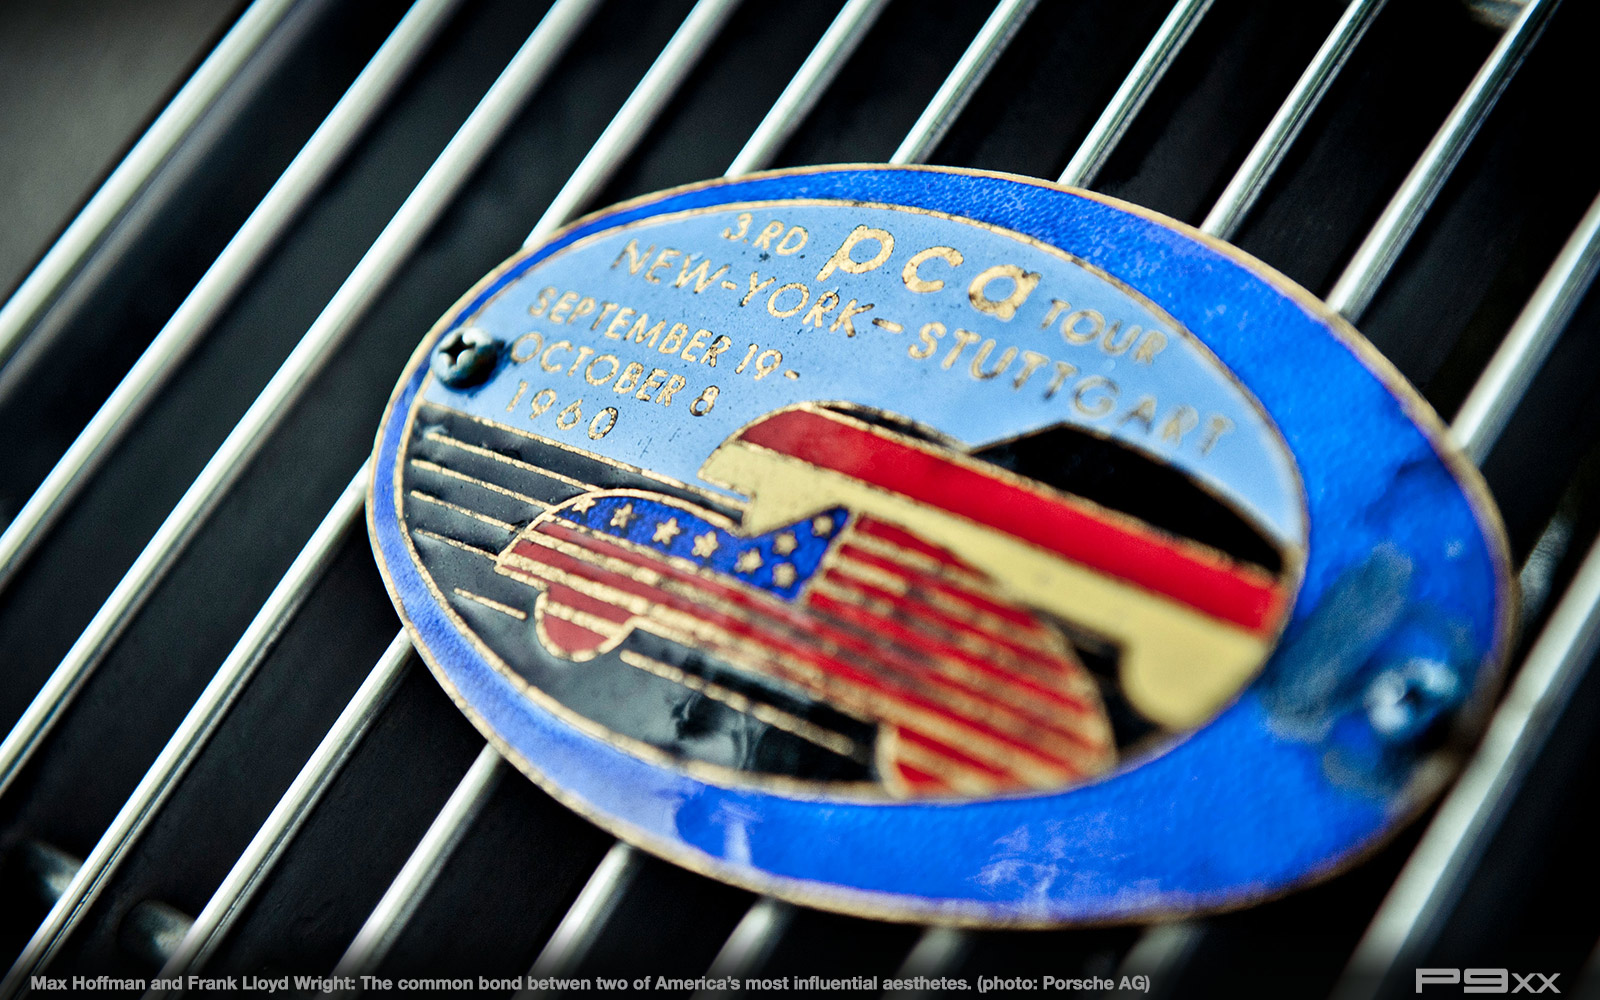 Max-Hoffman-Frank-Lloyd-Wright-Porsche-356-336